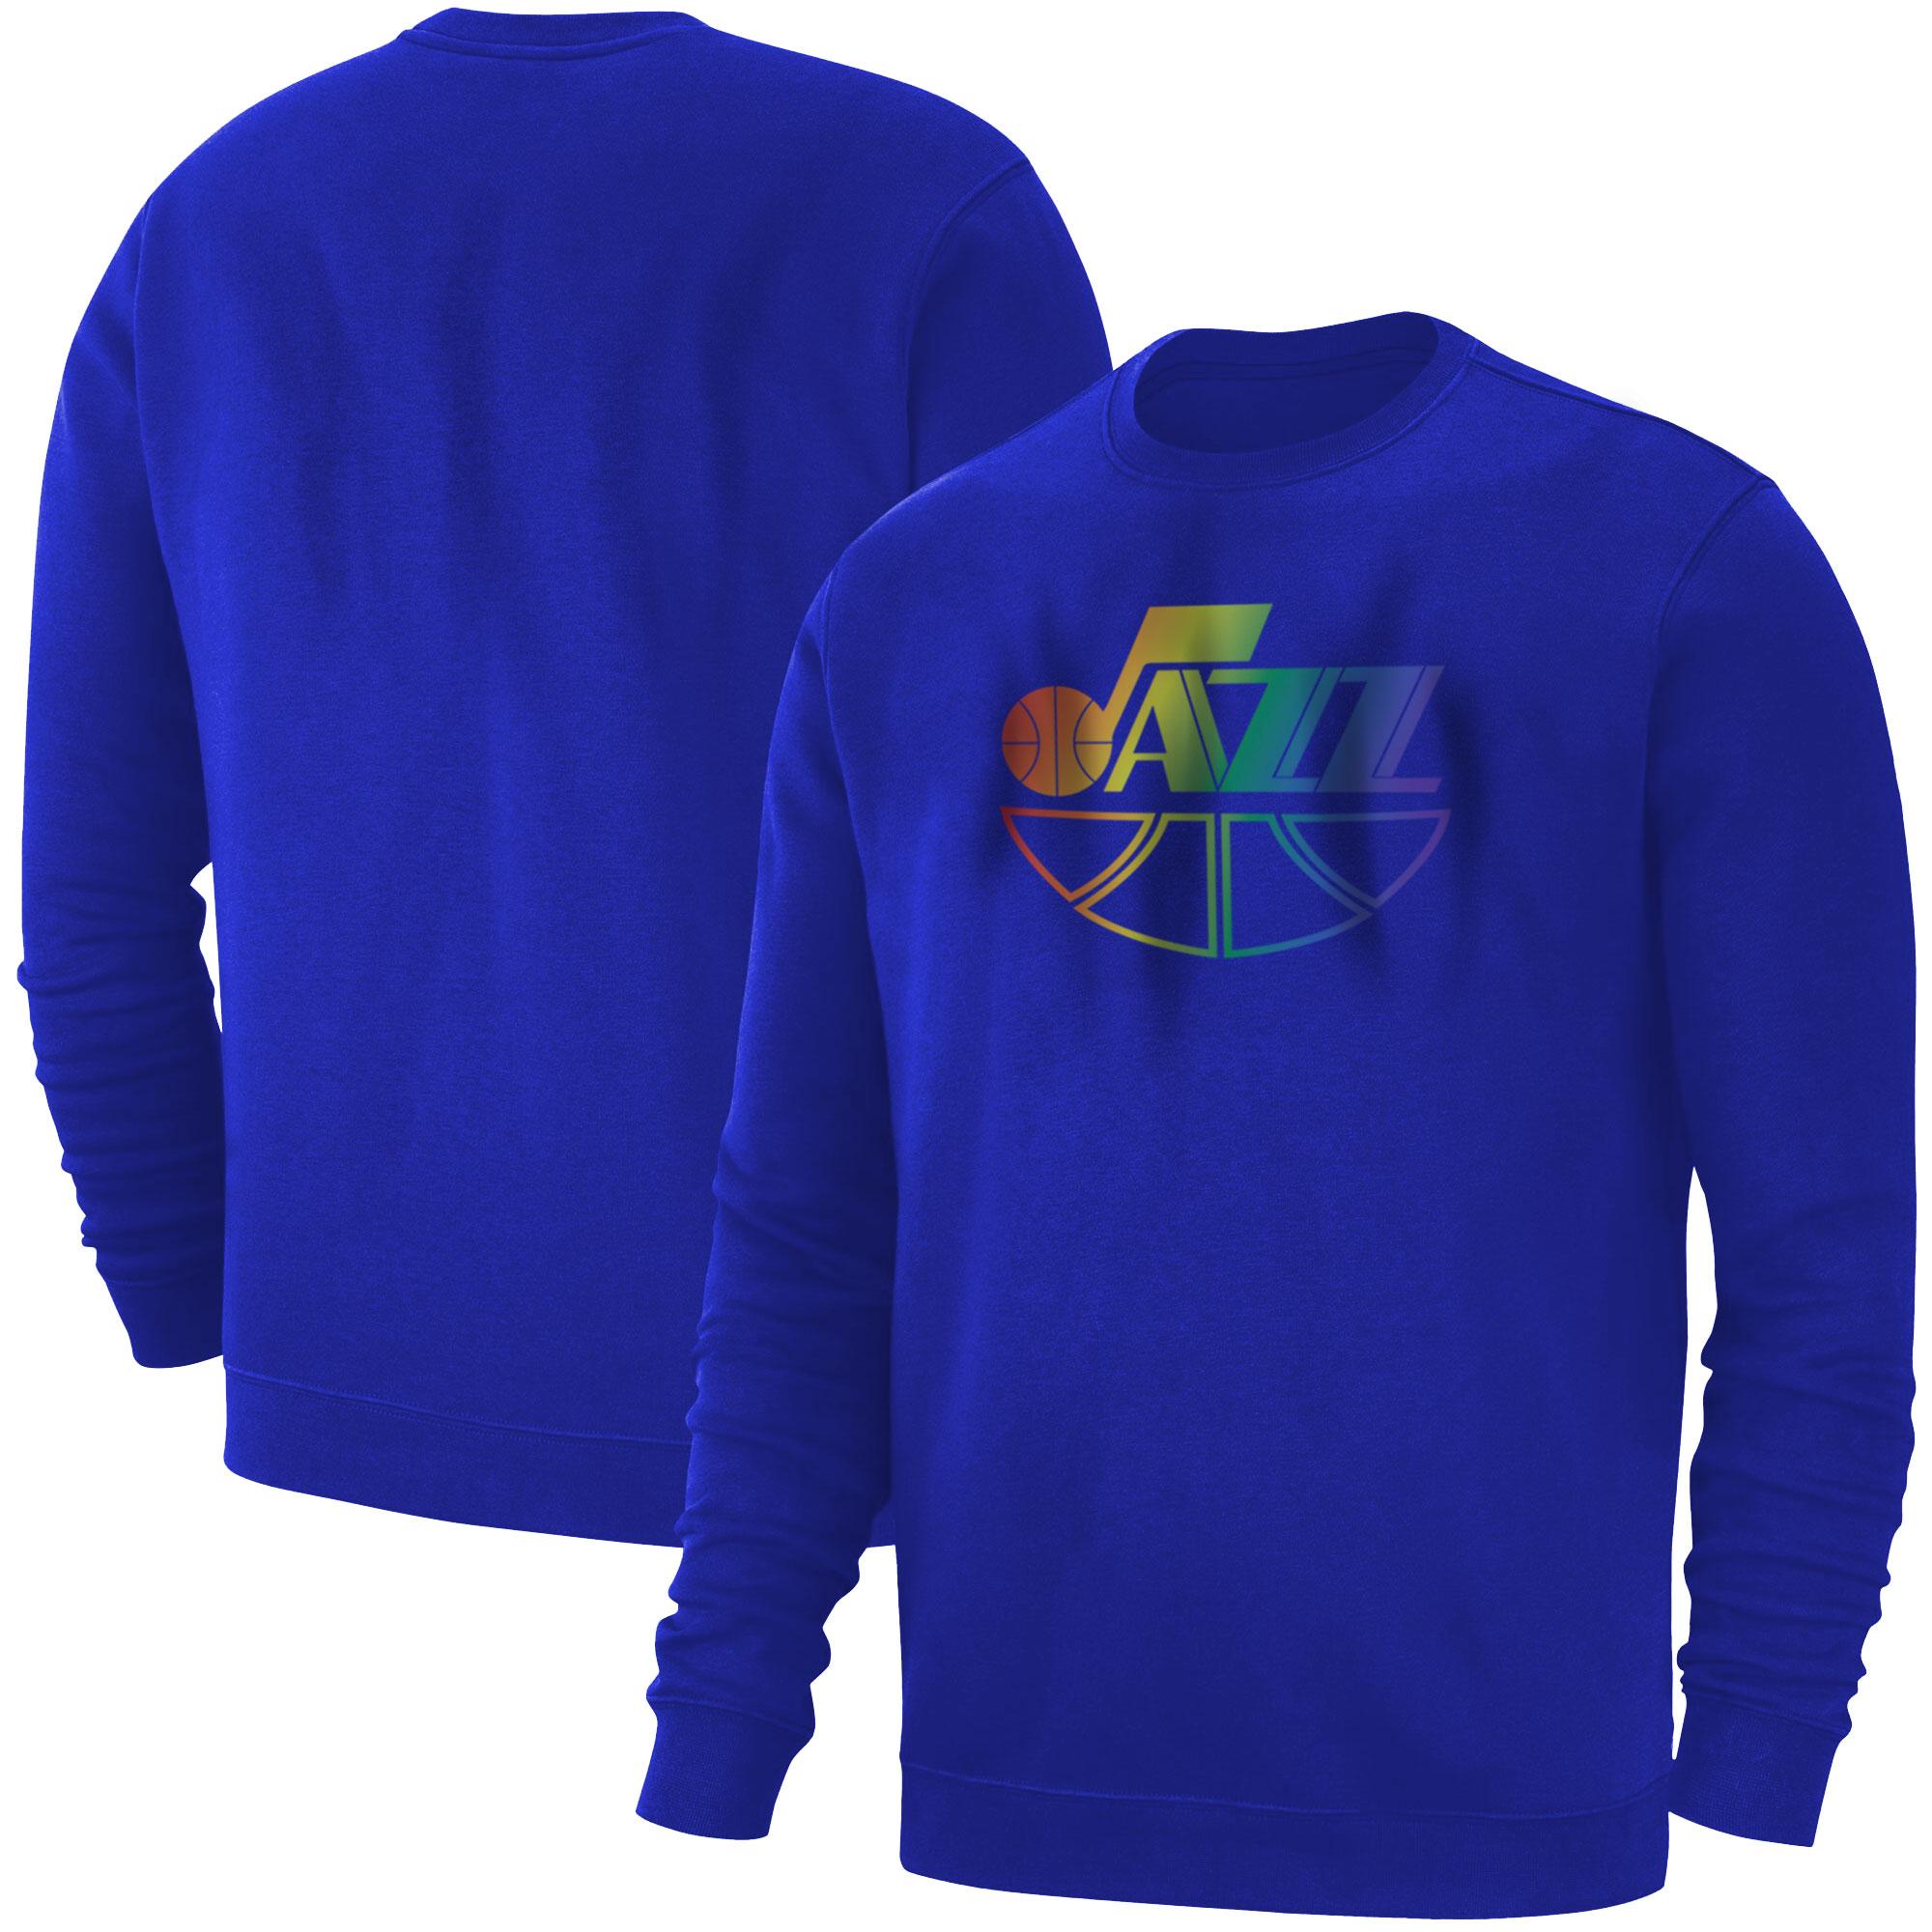 Utah Jazz Basic  (BSC-BLU-501-NBA-UTH)